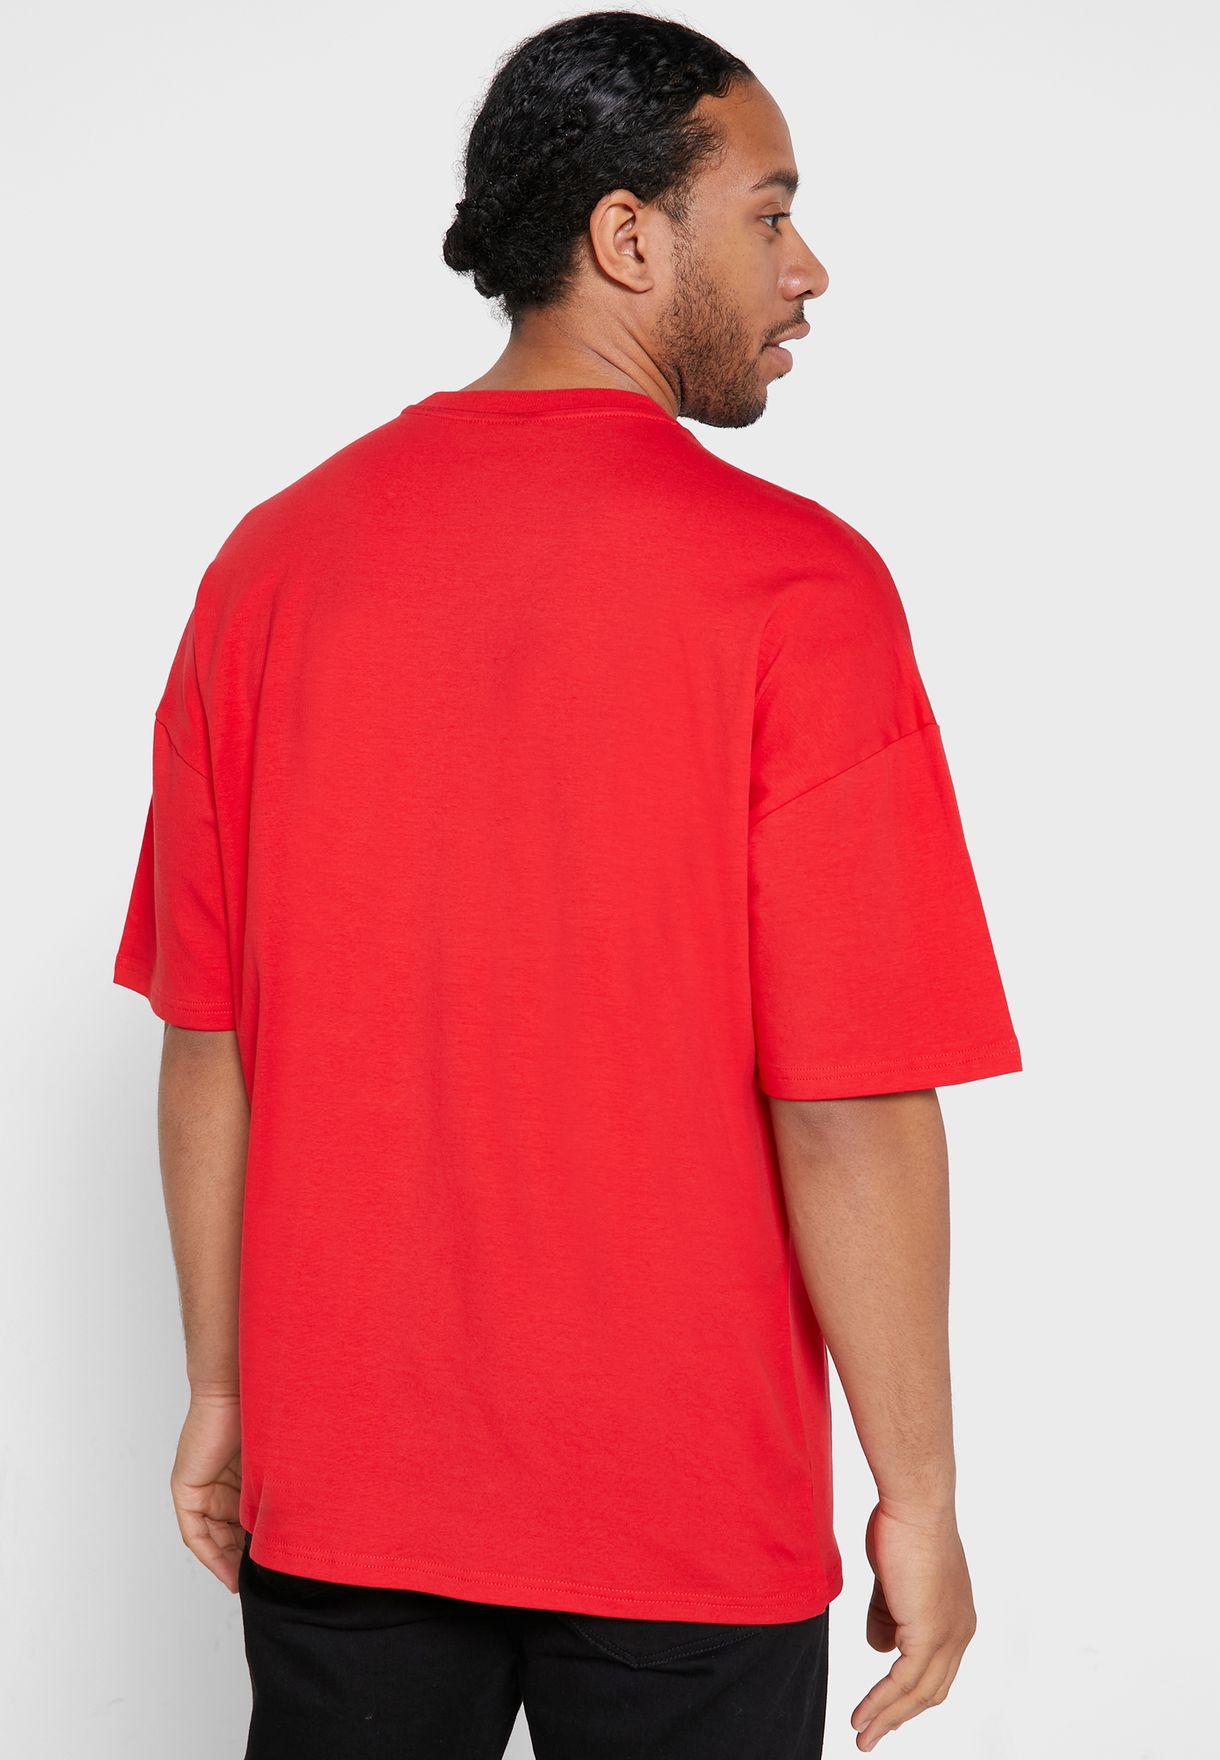 Inside Reef Loose T-Shirt